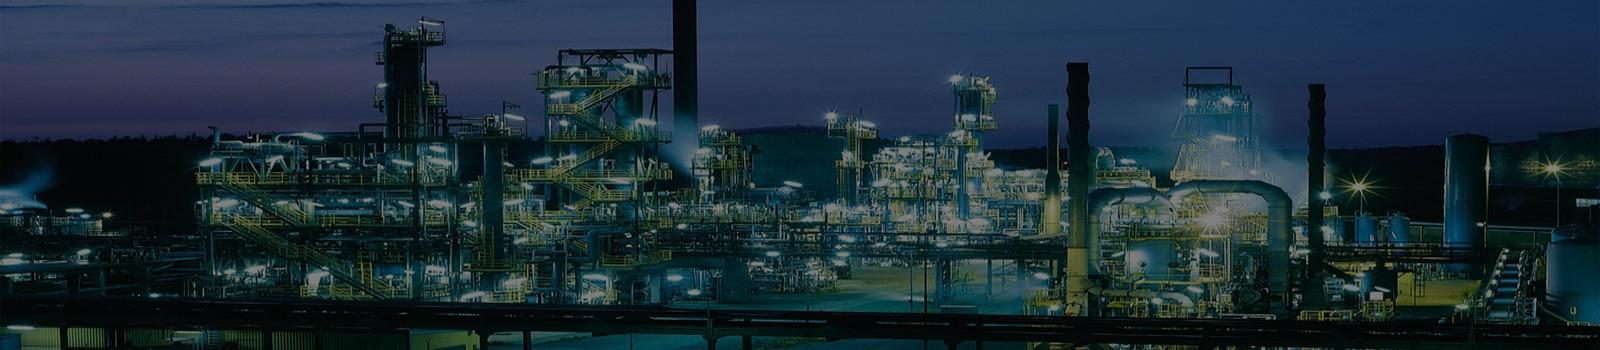 پالایشگاه گذرگاه صنعت Refinery compressor